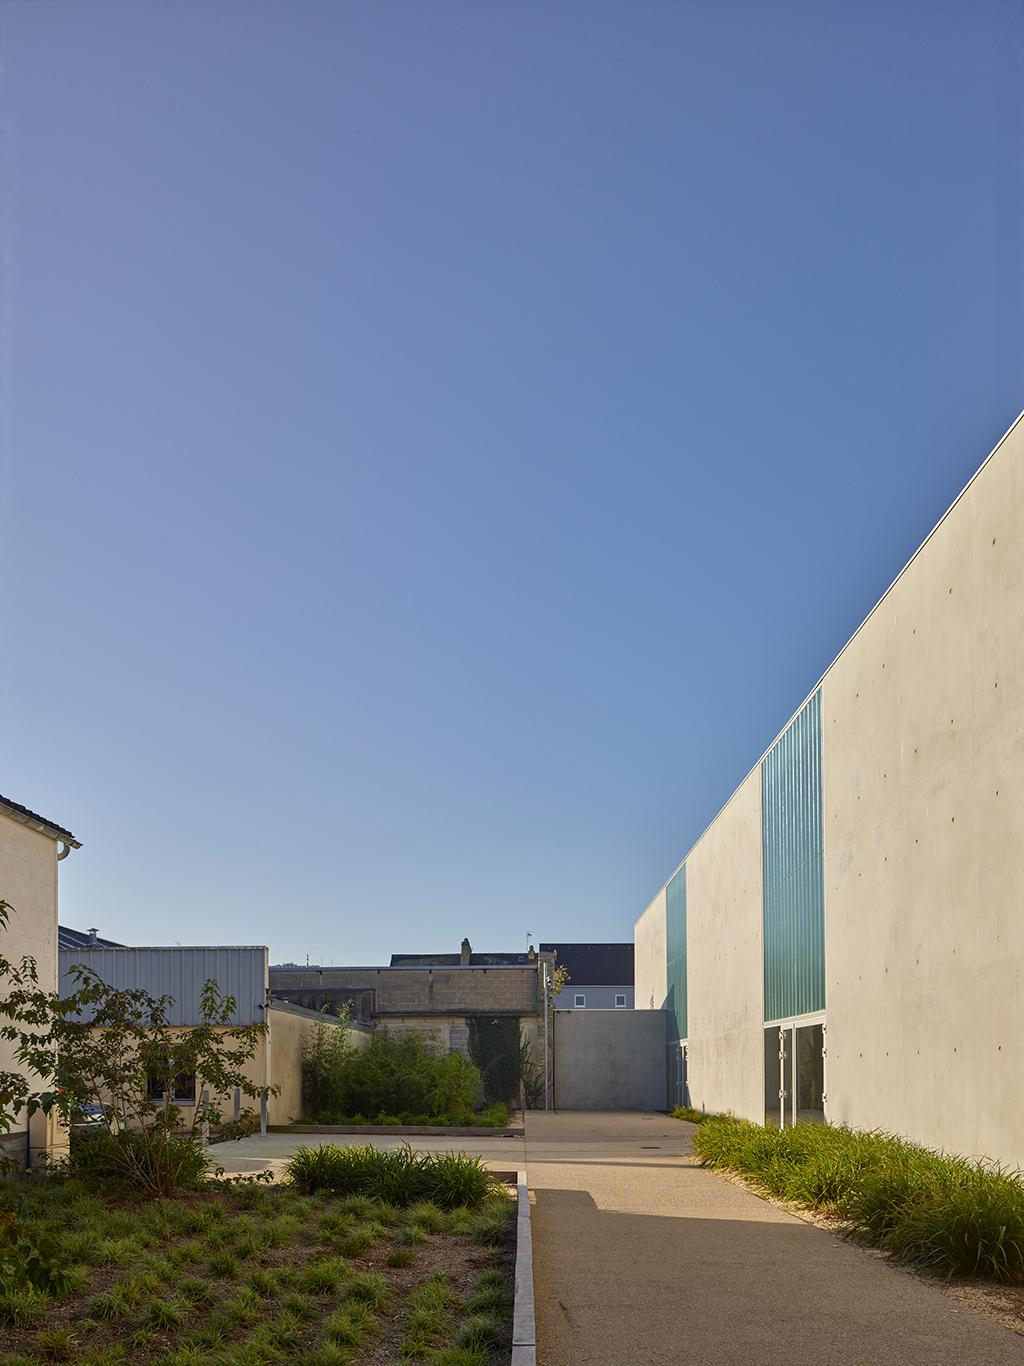 Cherbourg 04 - Salle de gymnastique – Cherbourg